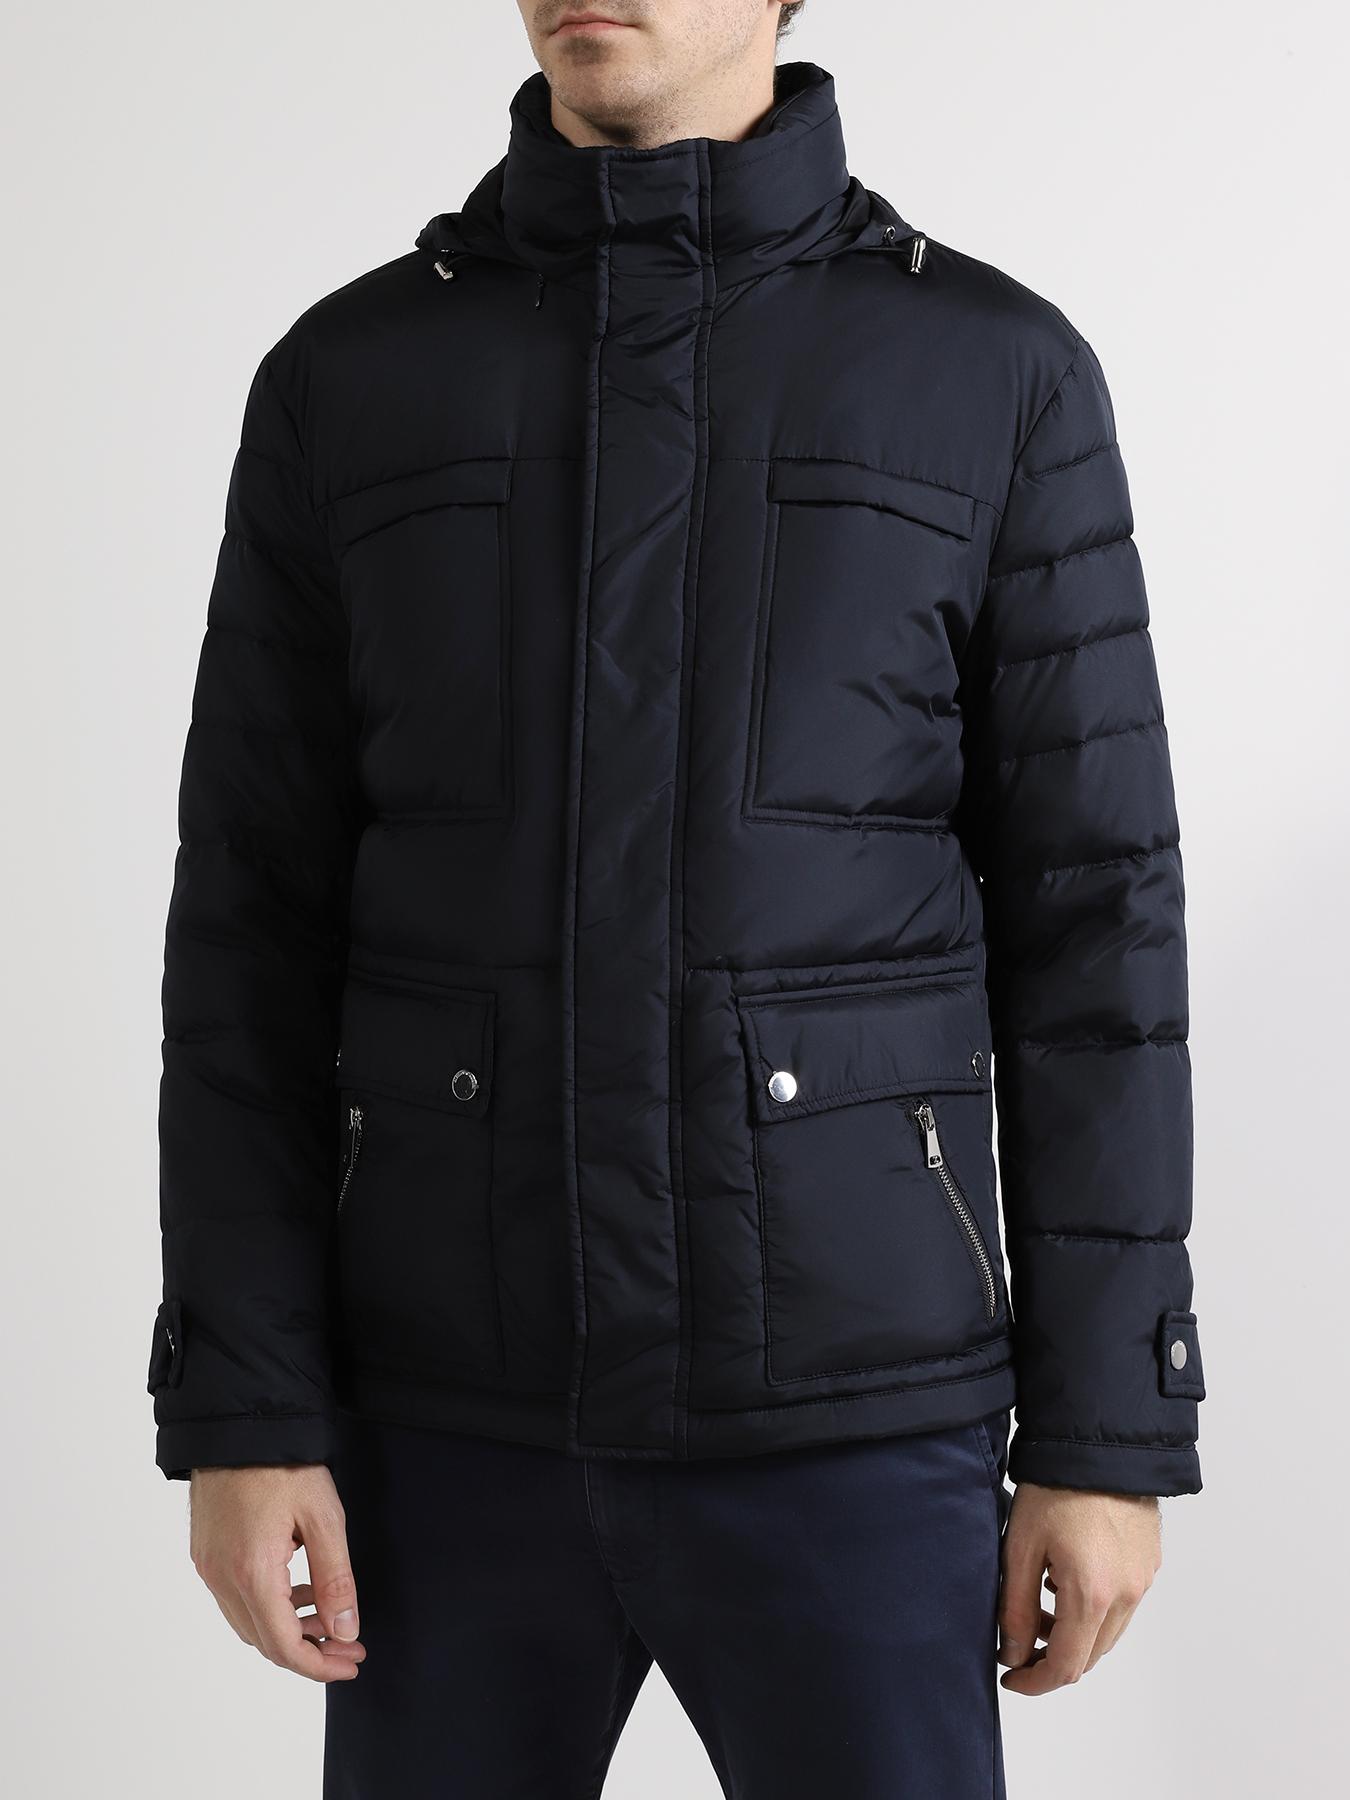 Alessandro Manzoni Alessandro Manzoni Мужская куртка